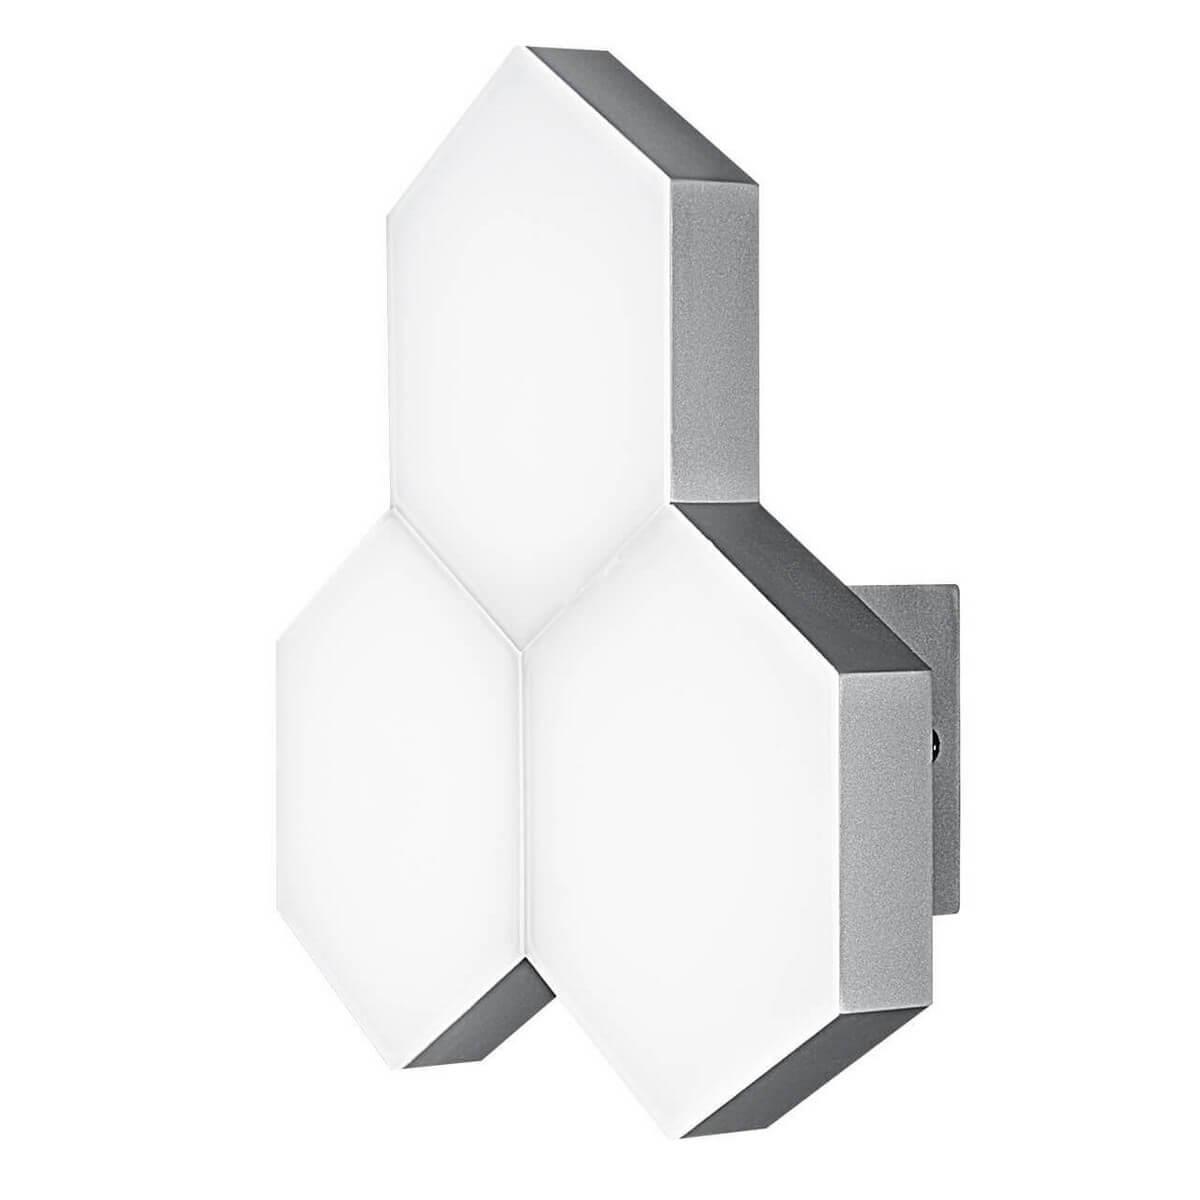 Настенный светильник Lightstar 750632, LED, 5 Вт цены онлайн